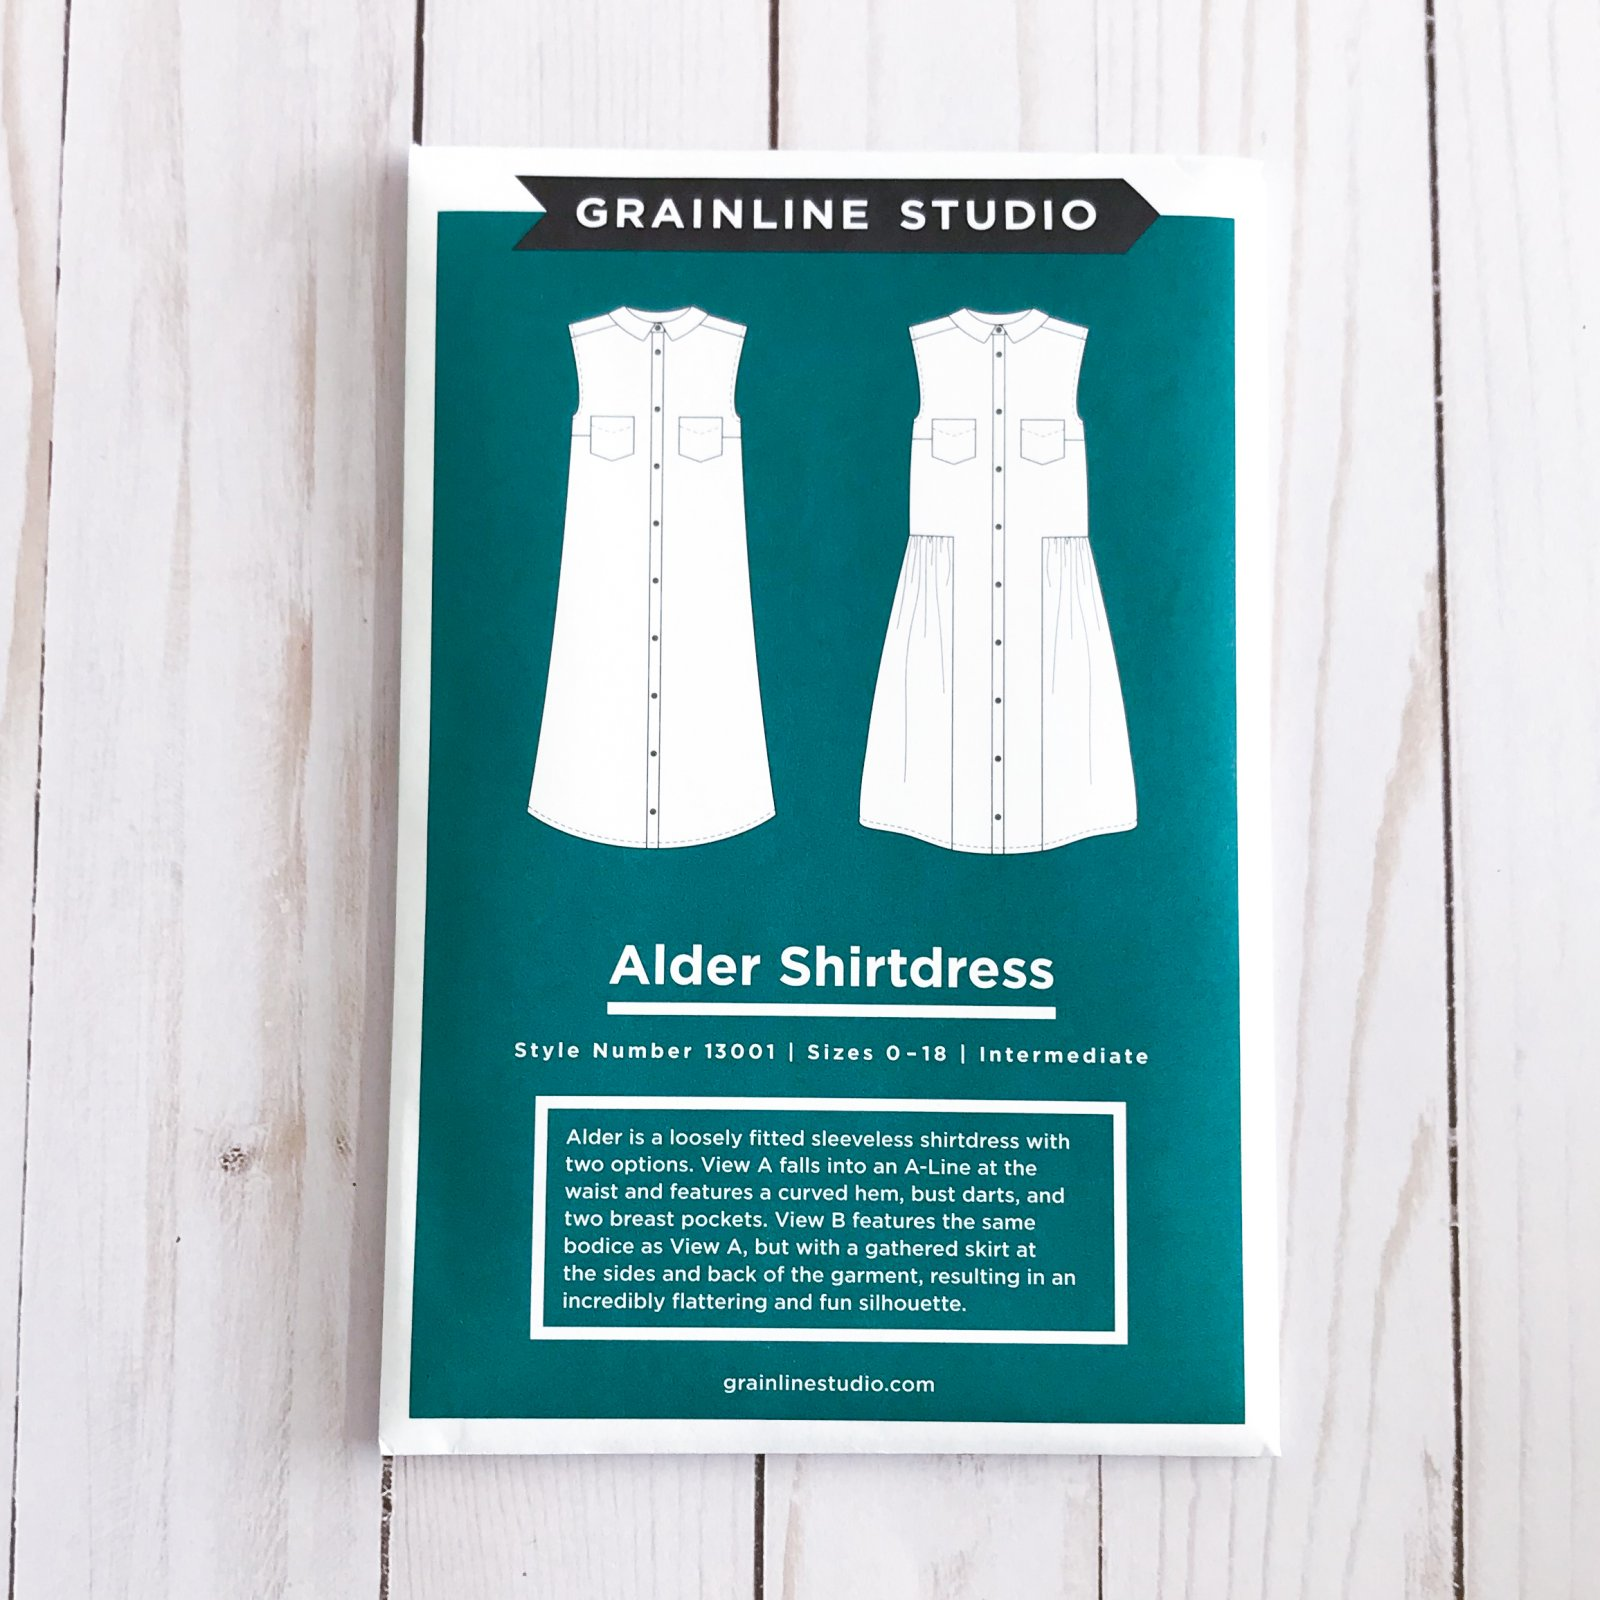 Grainline Studios - Alder Shirtdress